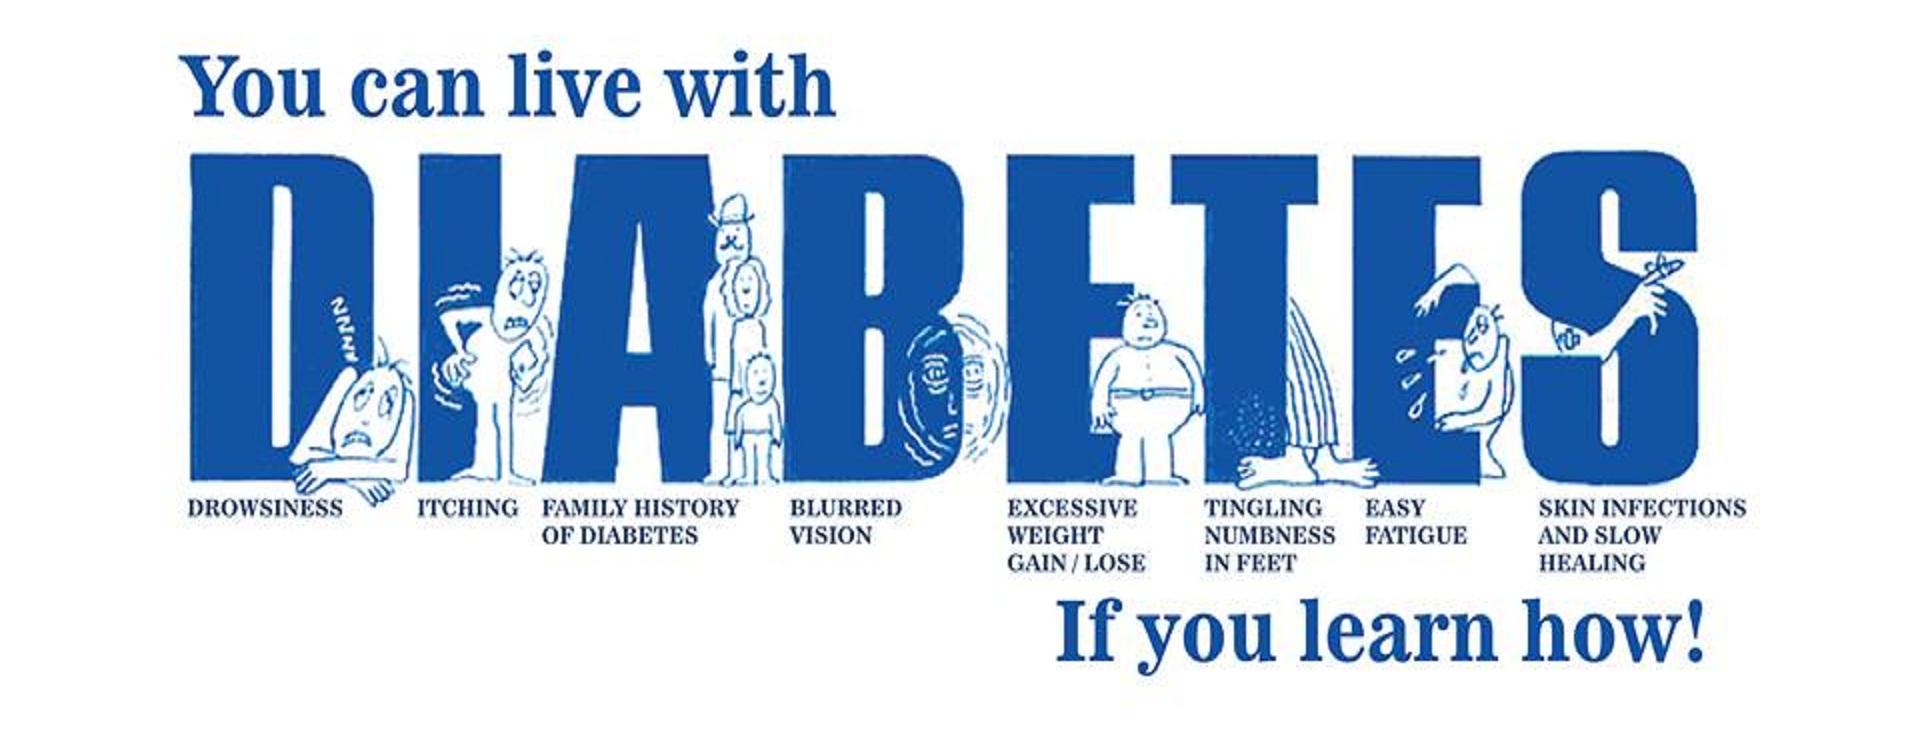 Diabetes wellness